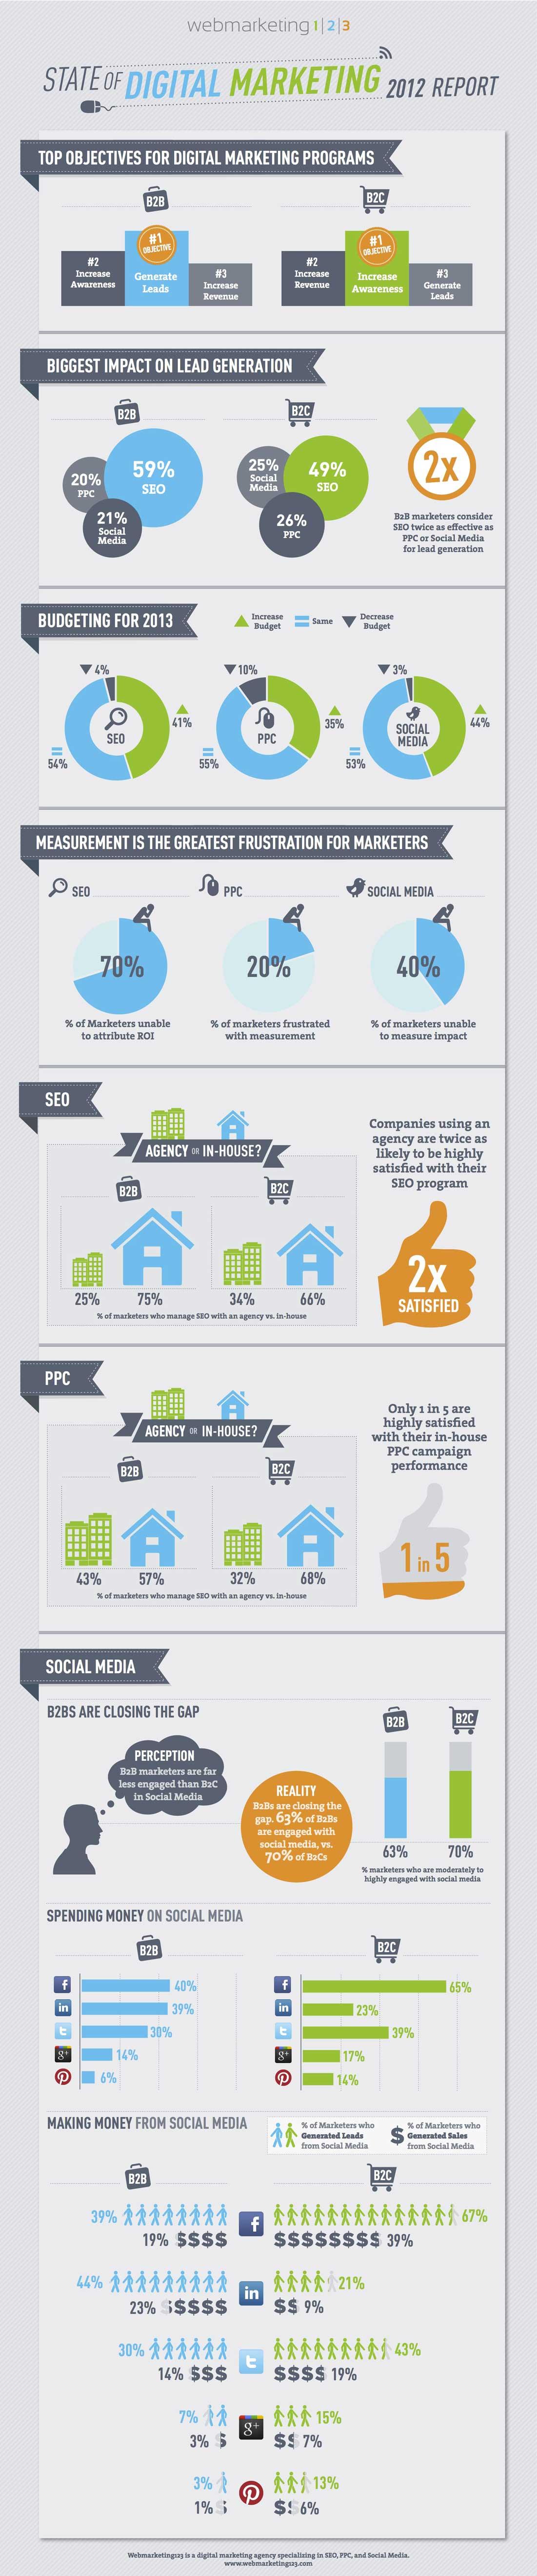 Digital Marketing Report 2012-Infographic